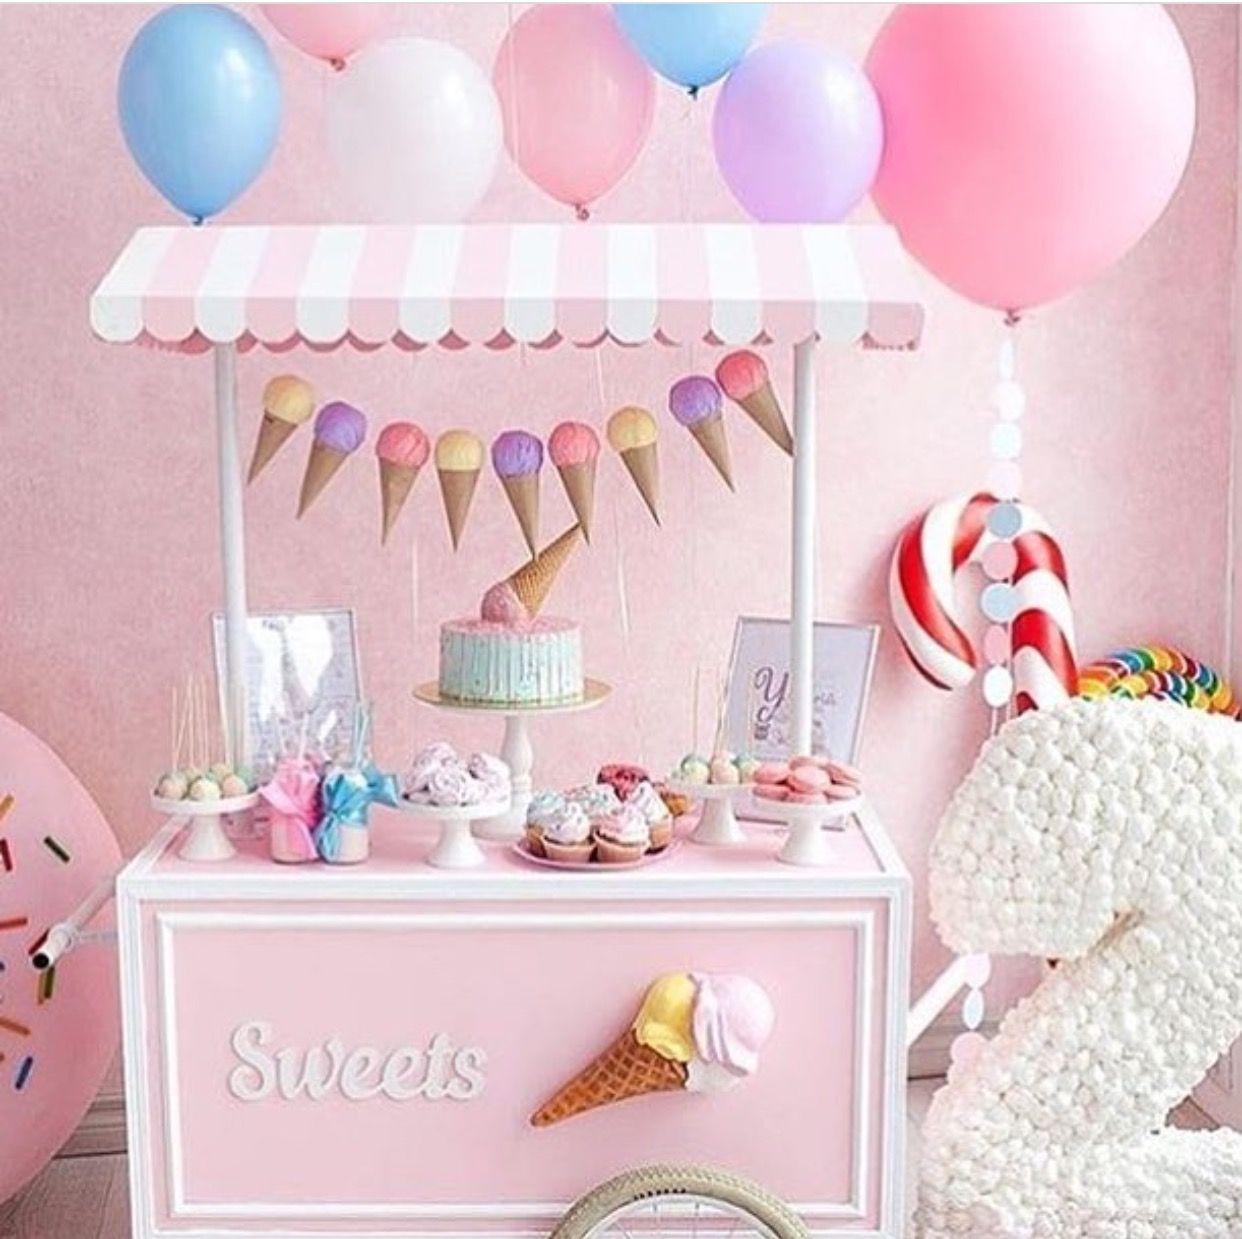 Carrito De Dulces Para Fiesta De Dulces Y Helados Winter Wonderland Birthday Party Birthday Party Themes 2 Year Old Birthday Party